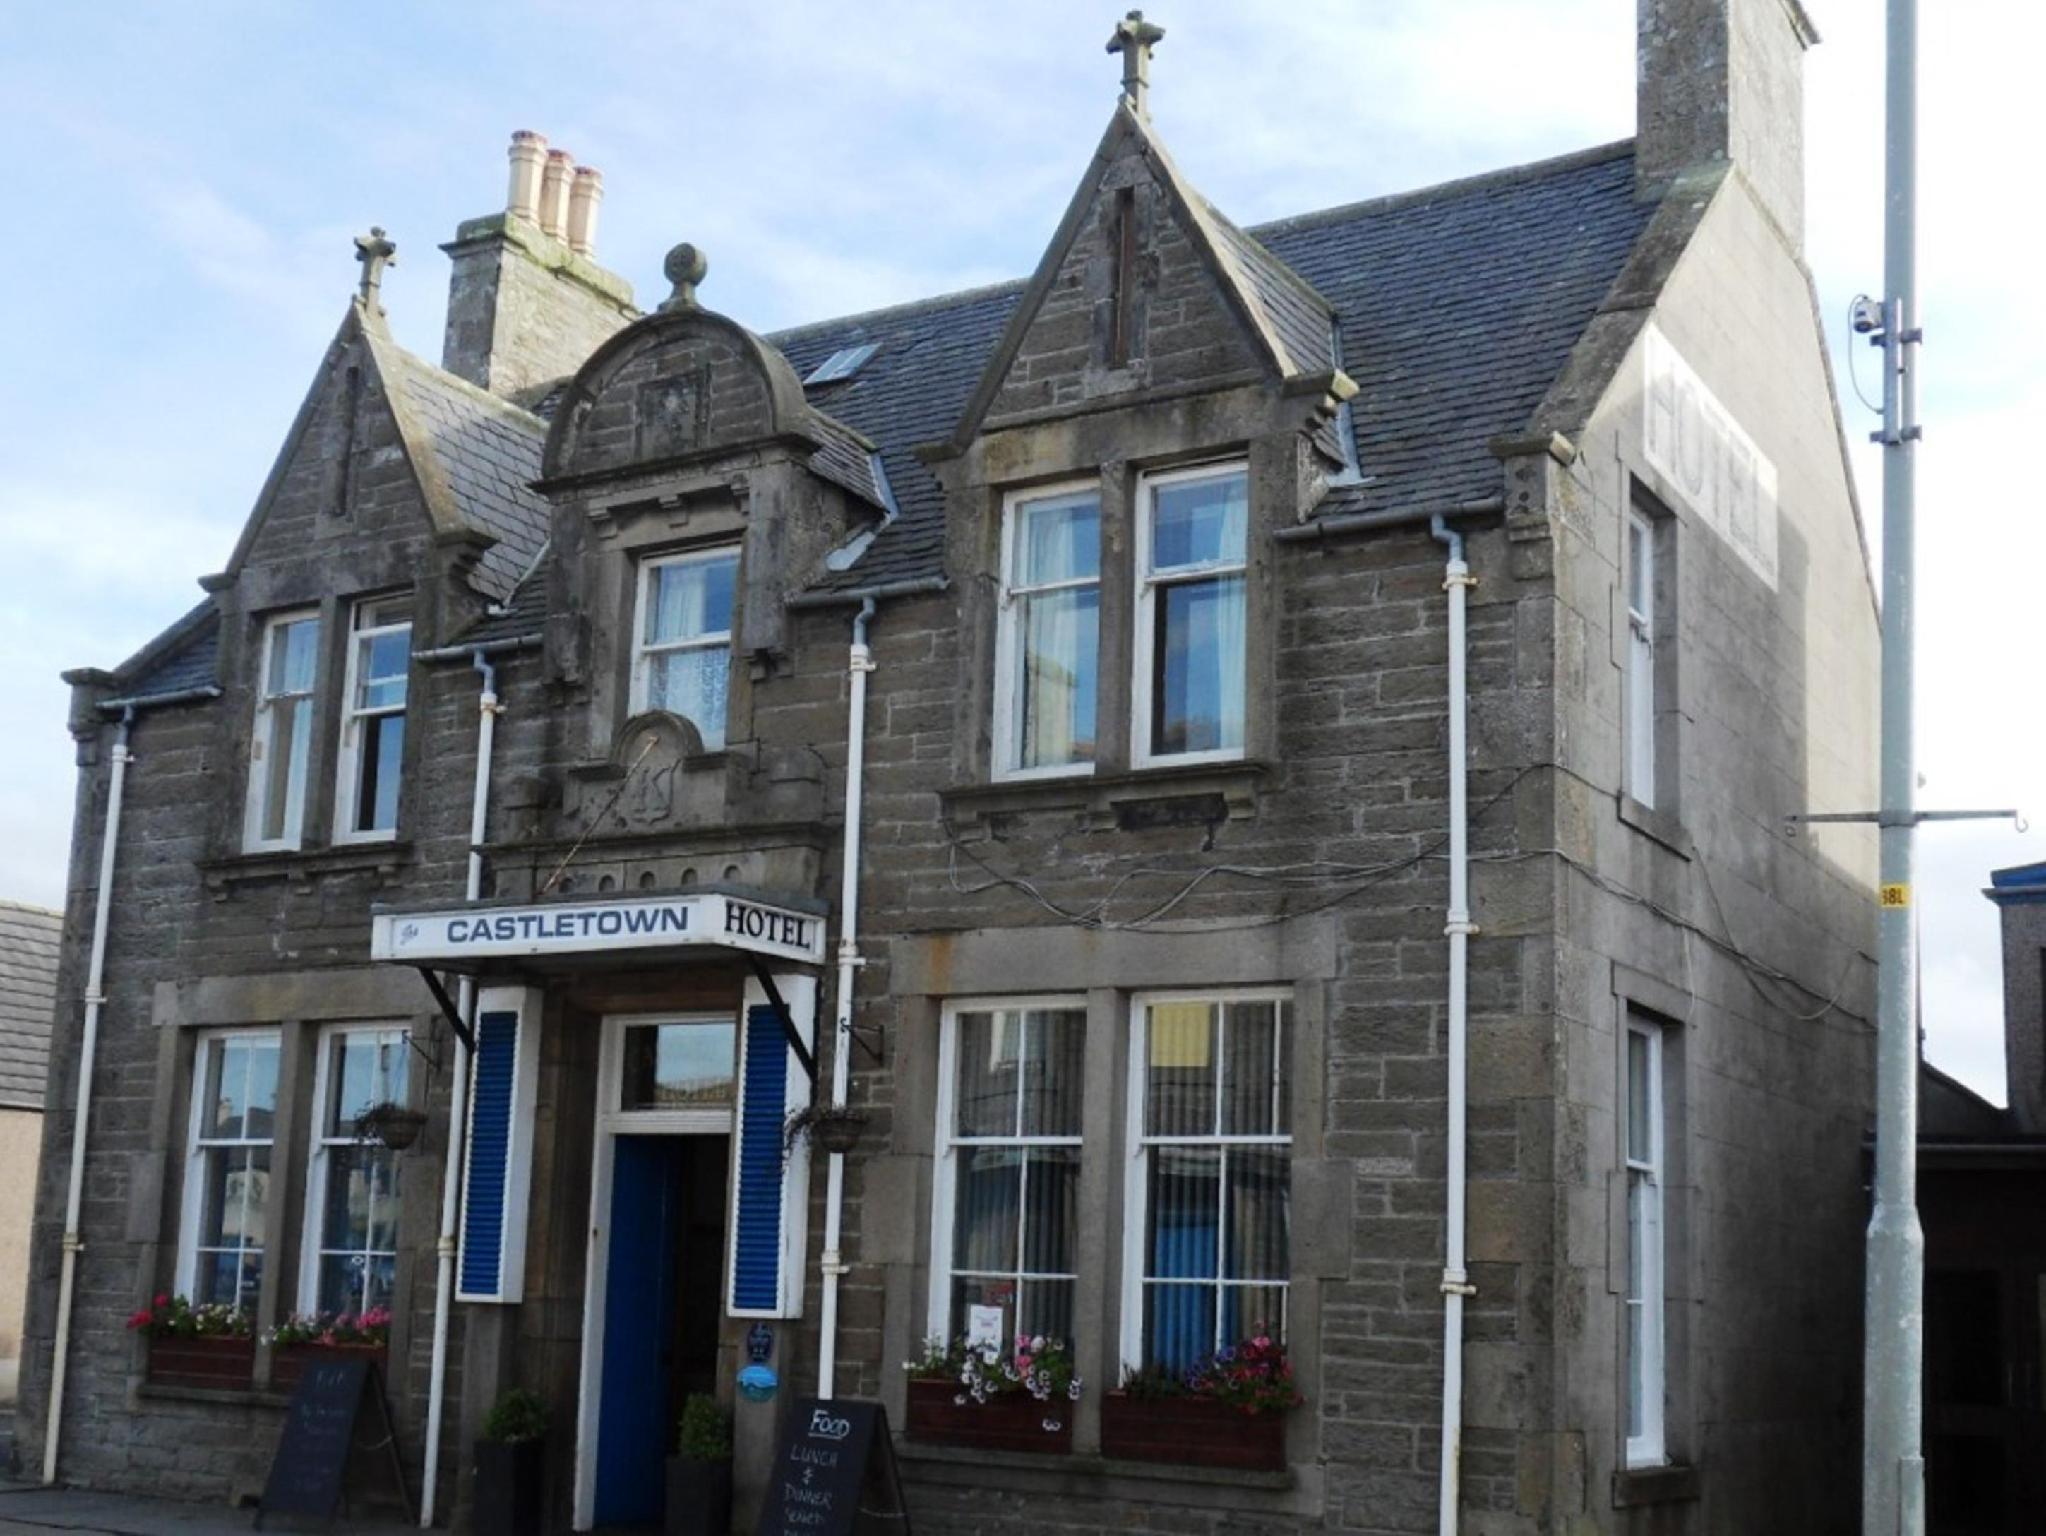 Castletown Hotel